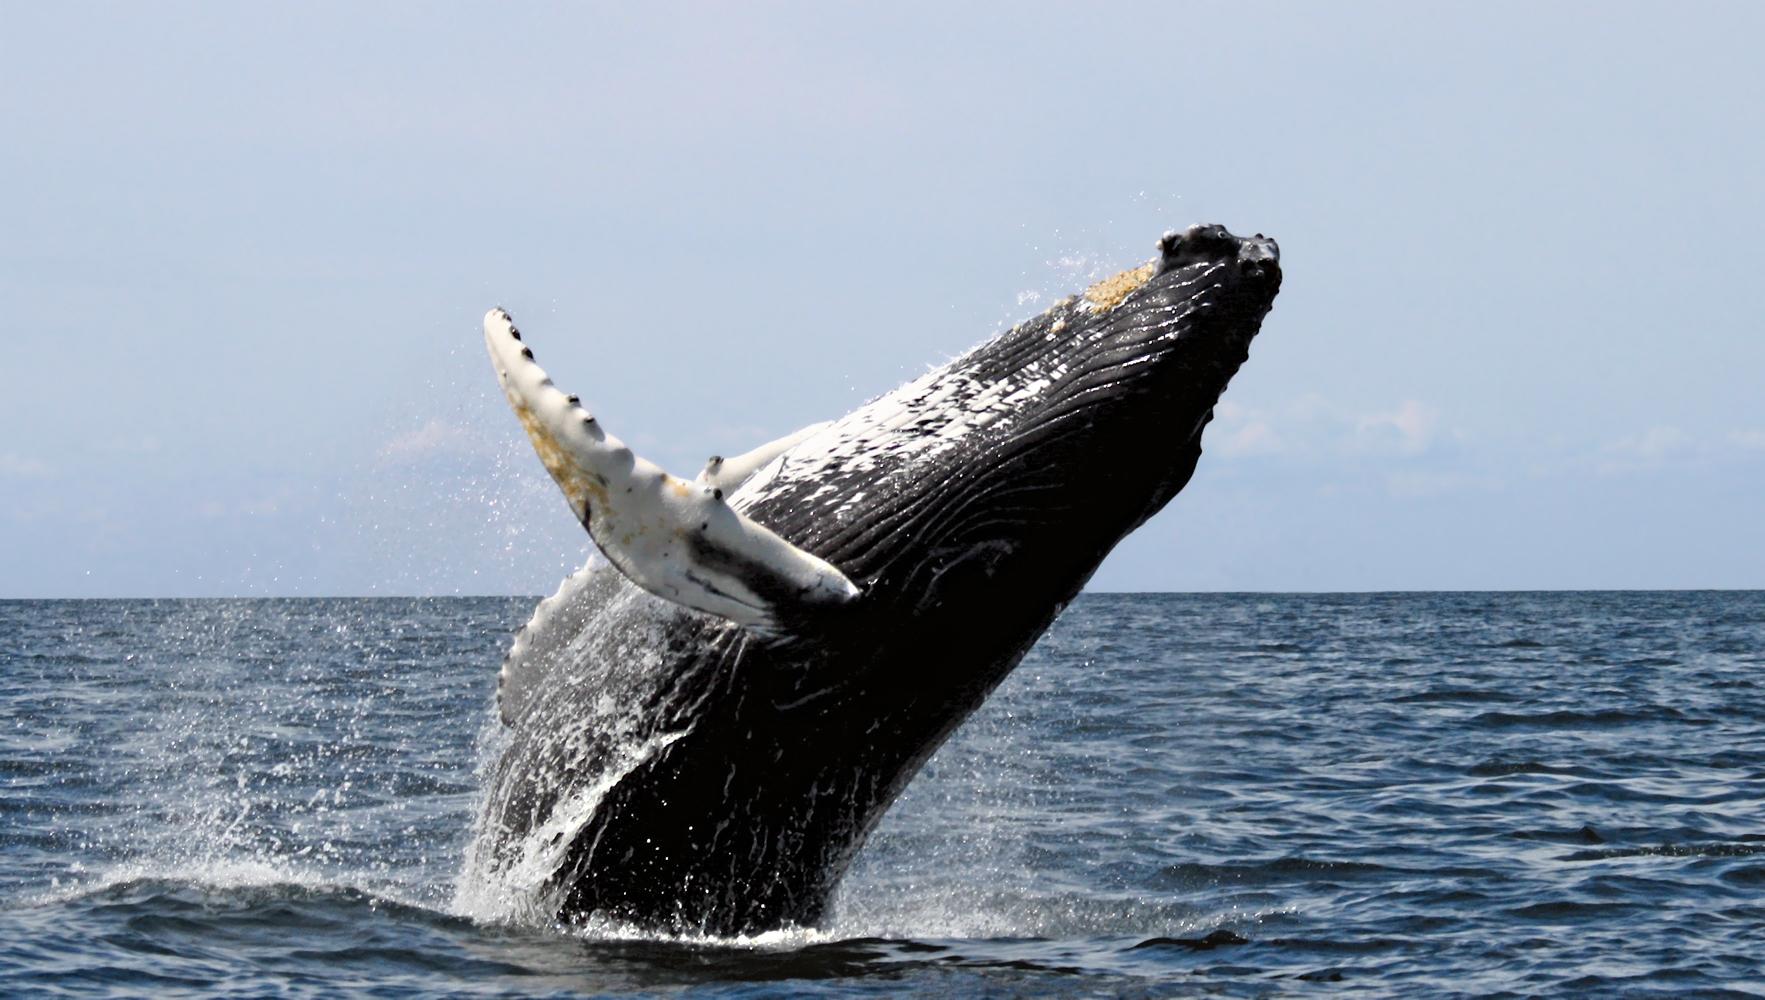 Humpback Stellwagen Whales Wallpapers Desktop HD Whales Humpback Hd 1765x1000